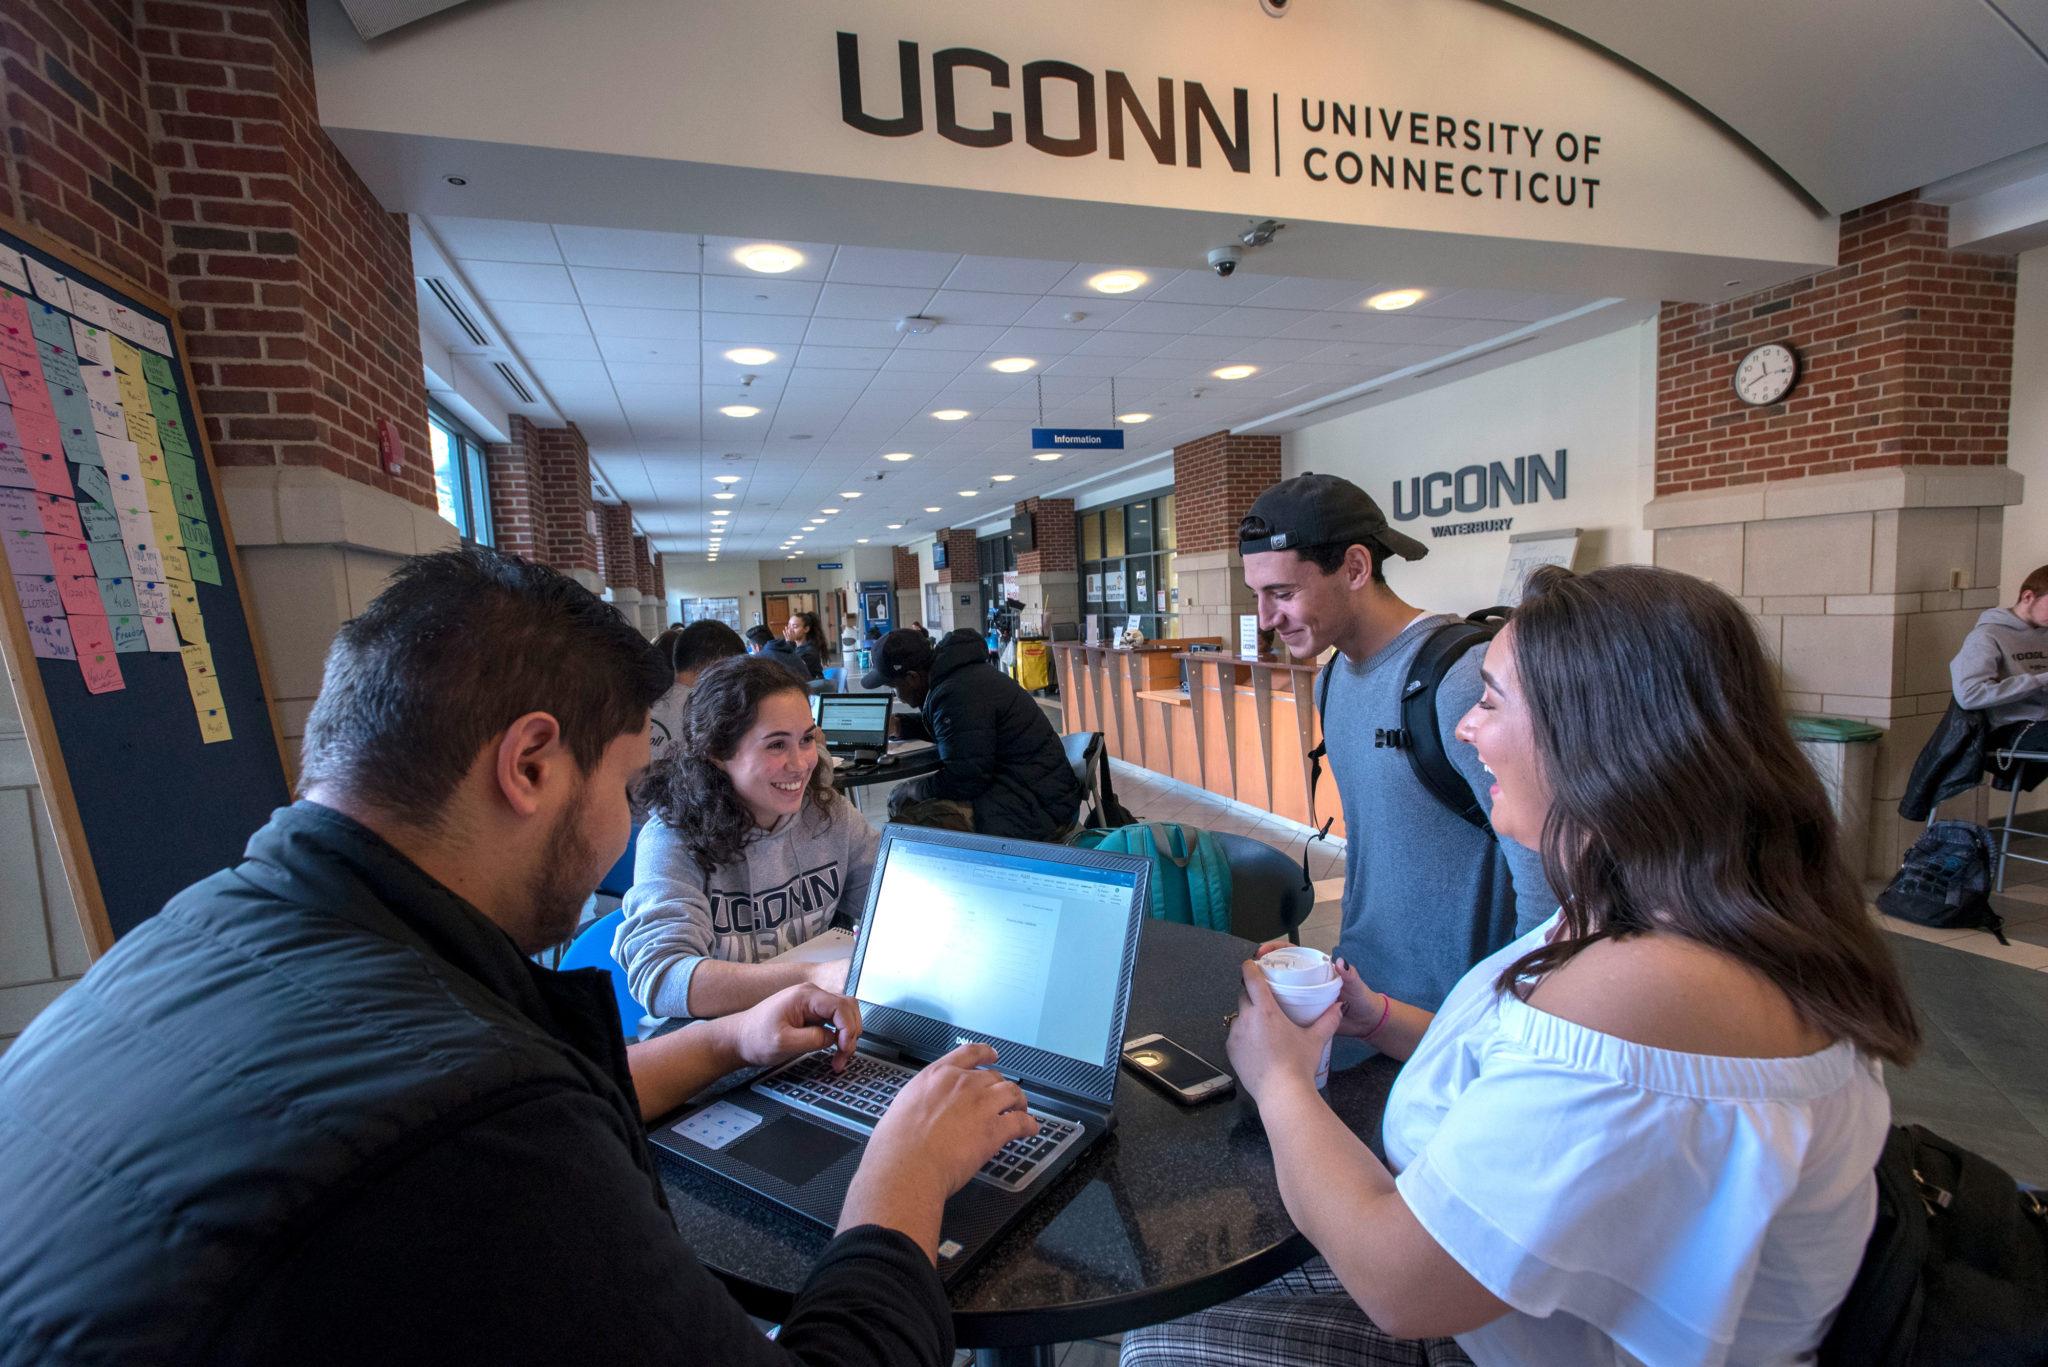 Students studying at Uconn Waterbury